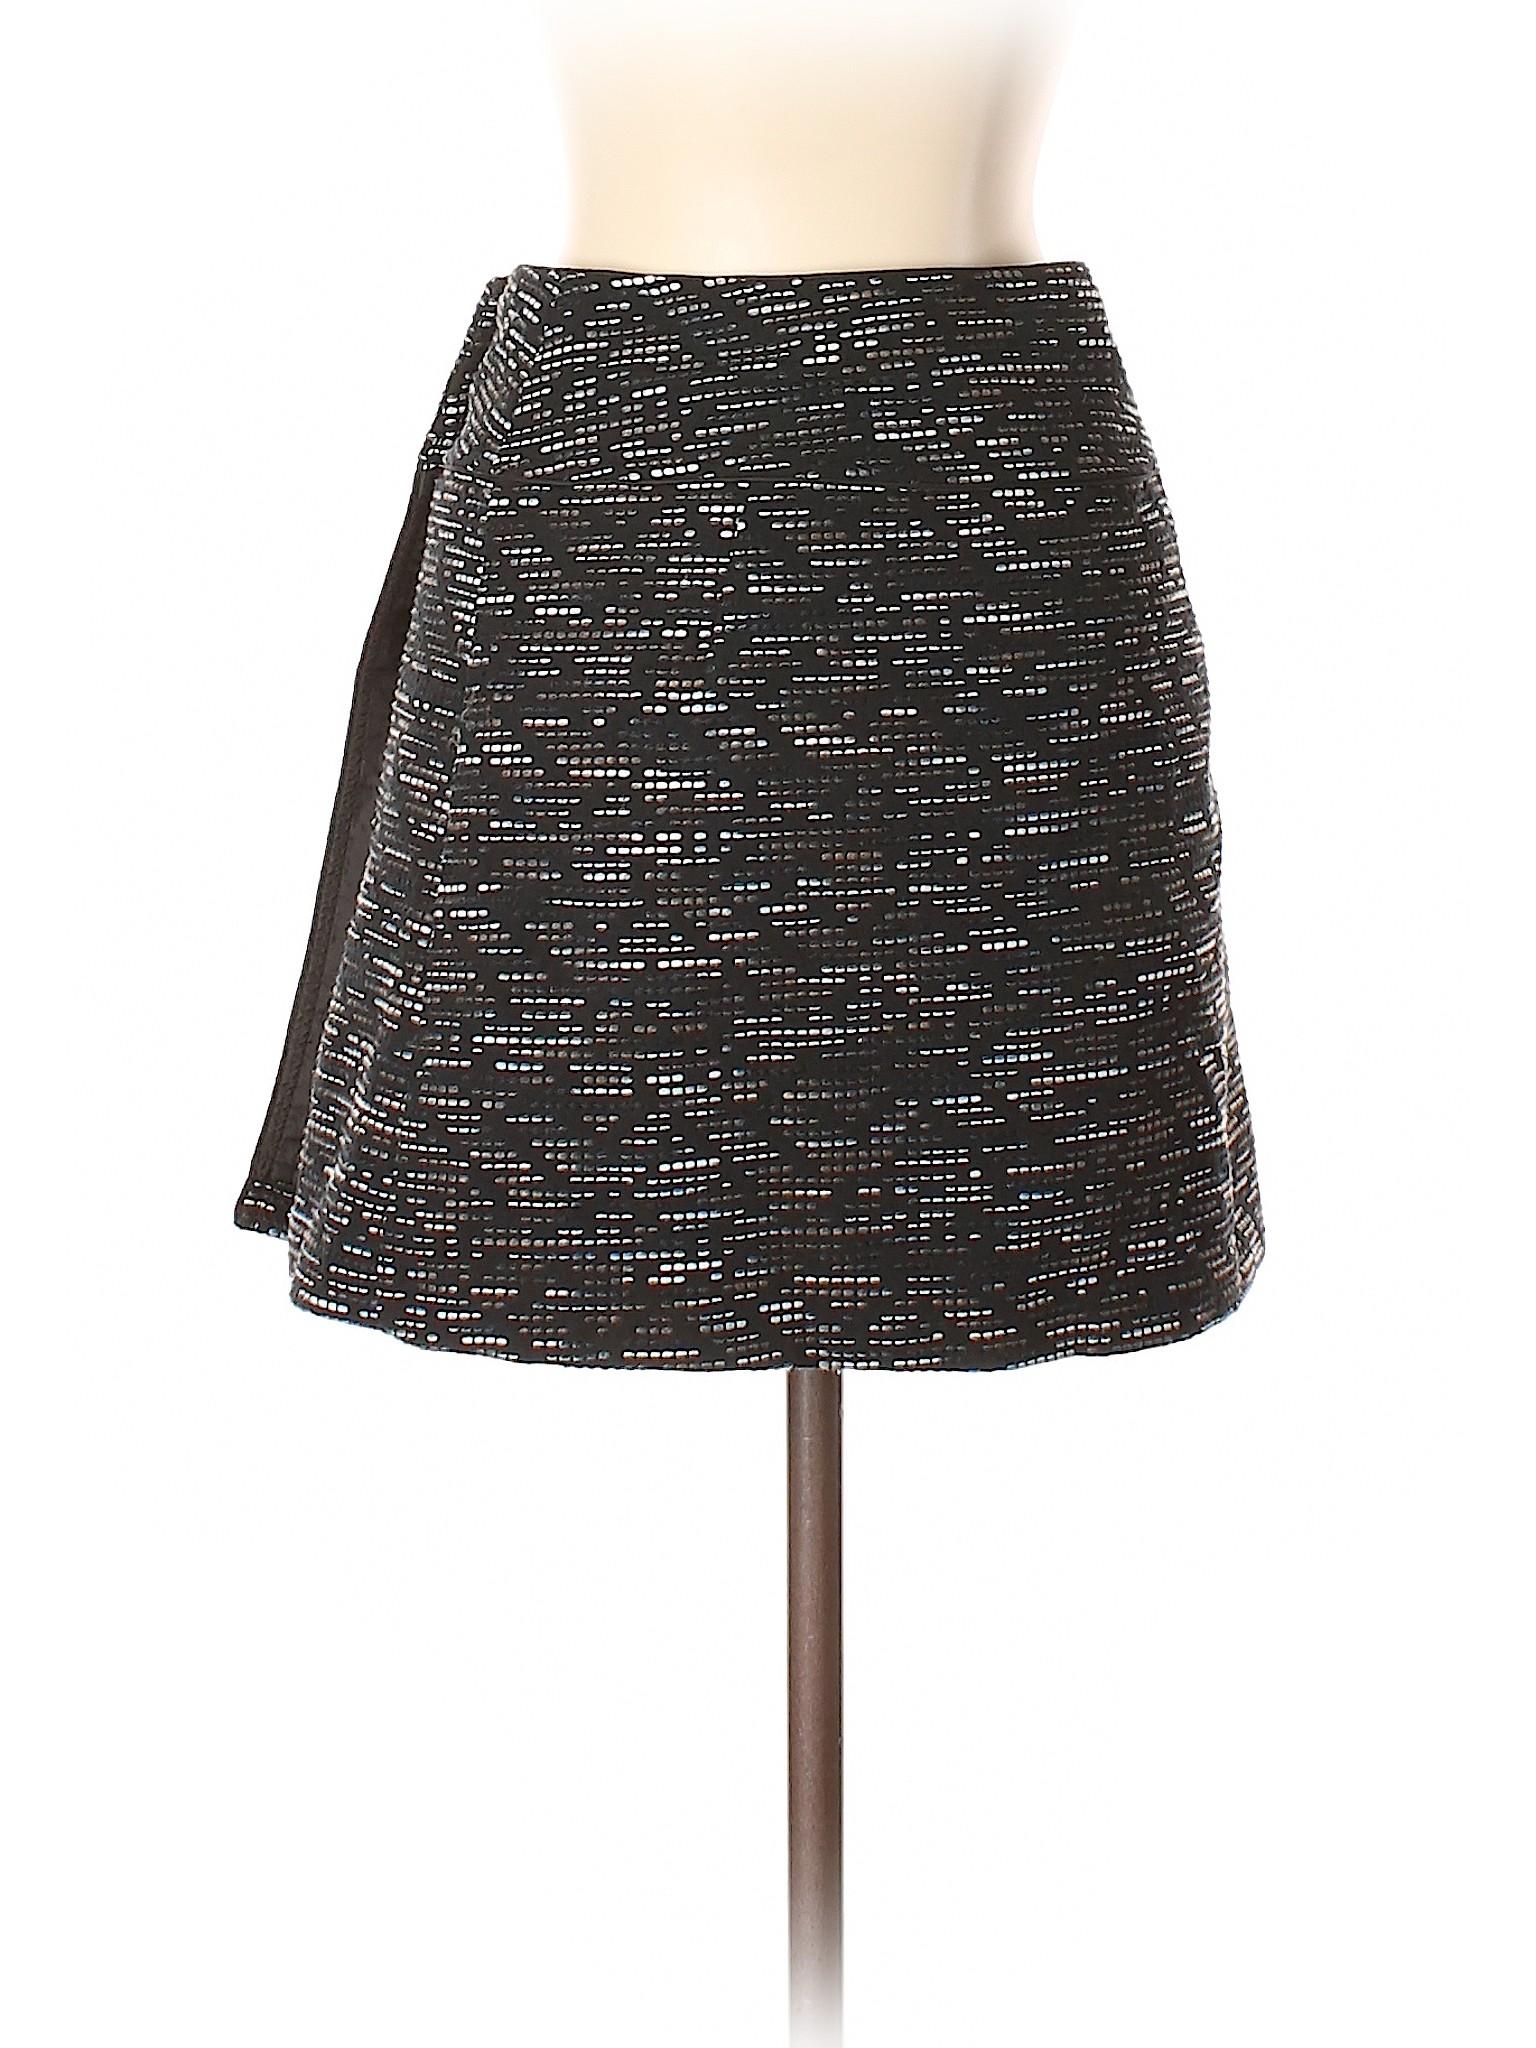 Skirt Skirt Skirt Boutique Boutique Casual Boutique Casual Casual SPv8HwqP